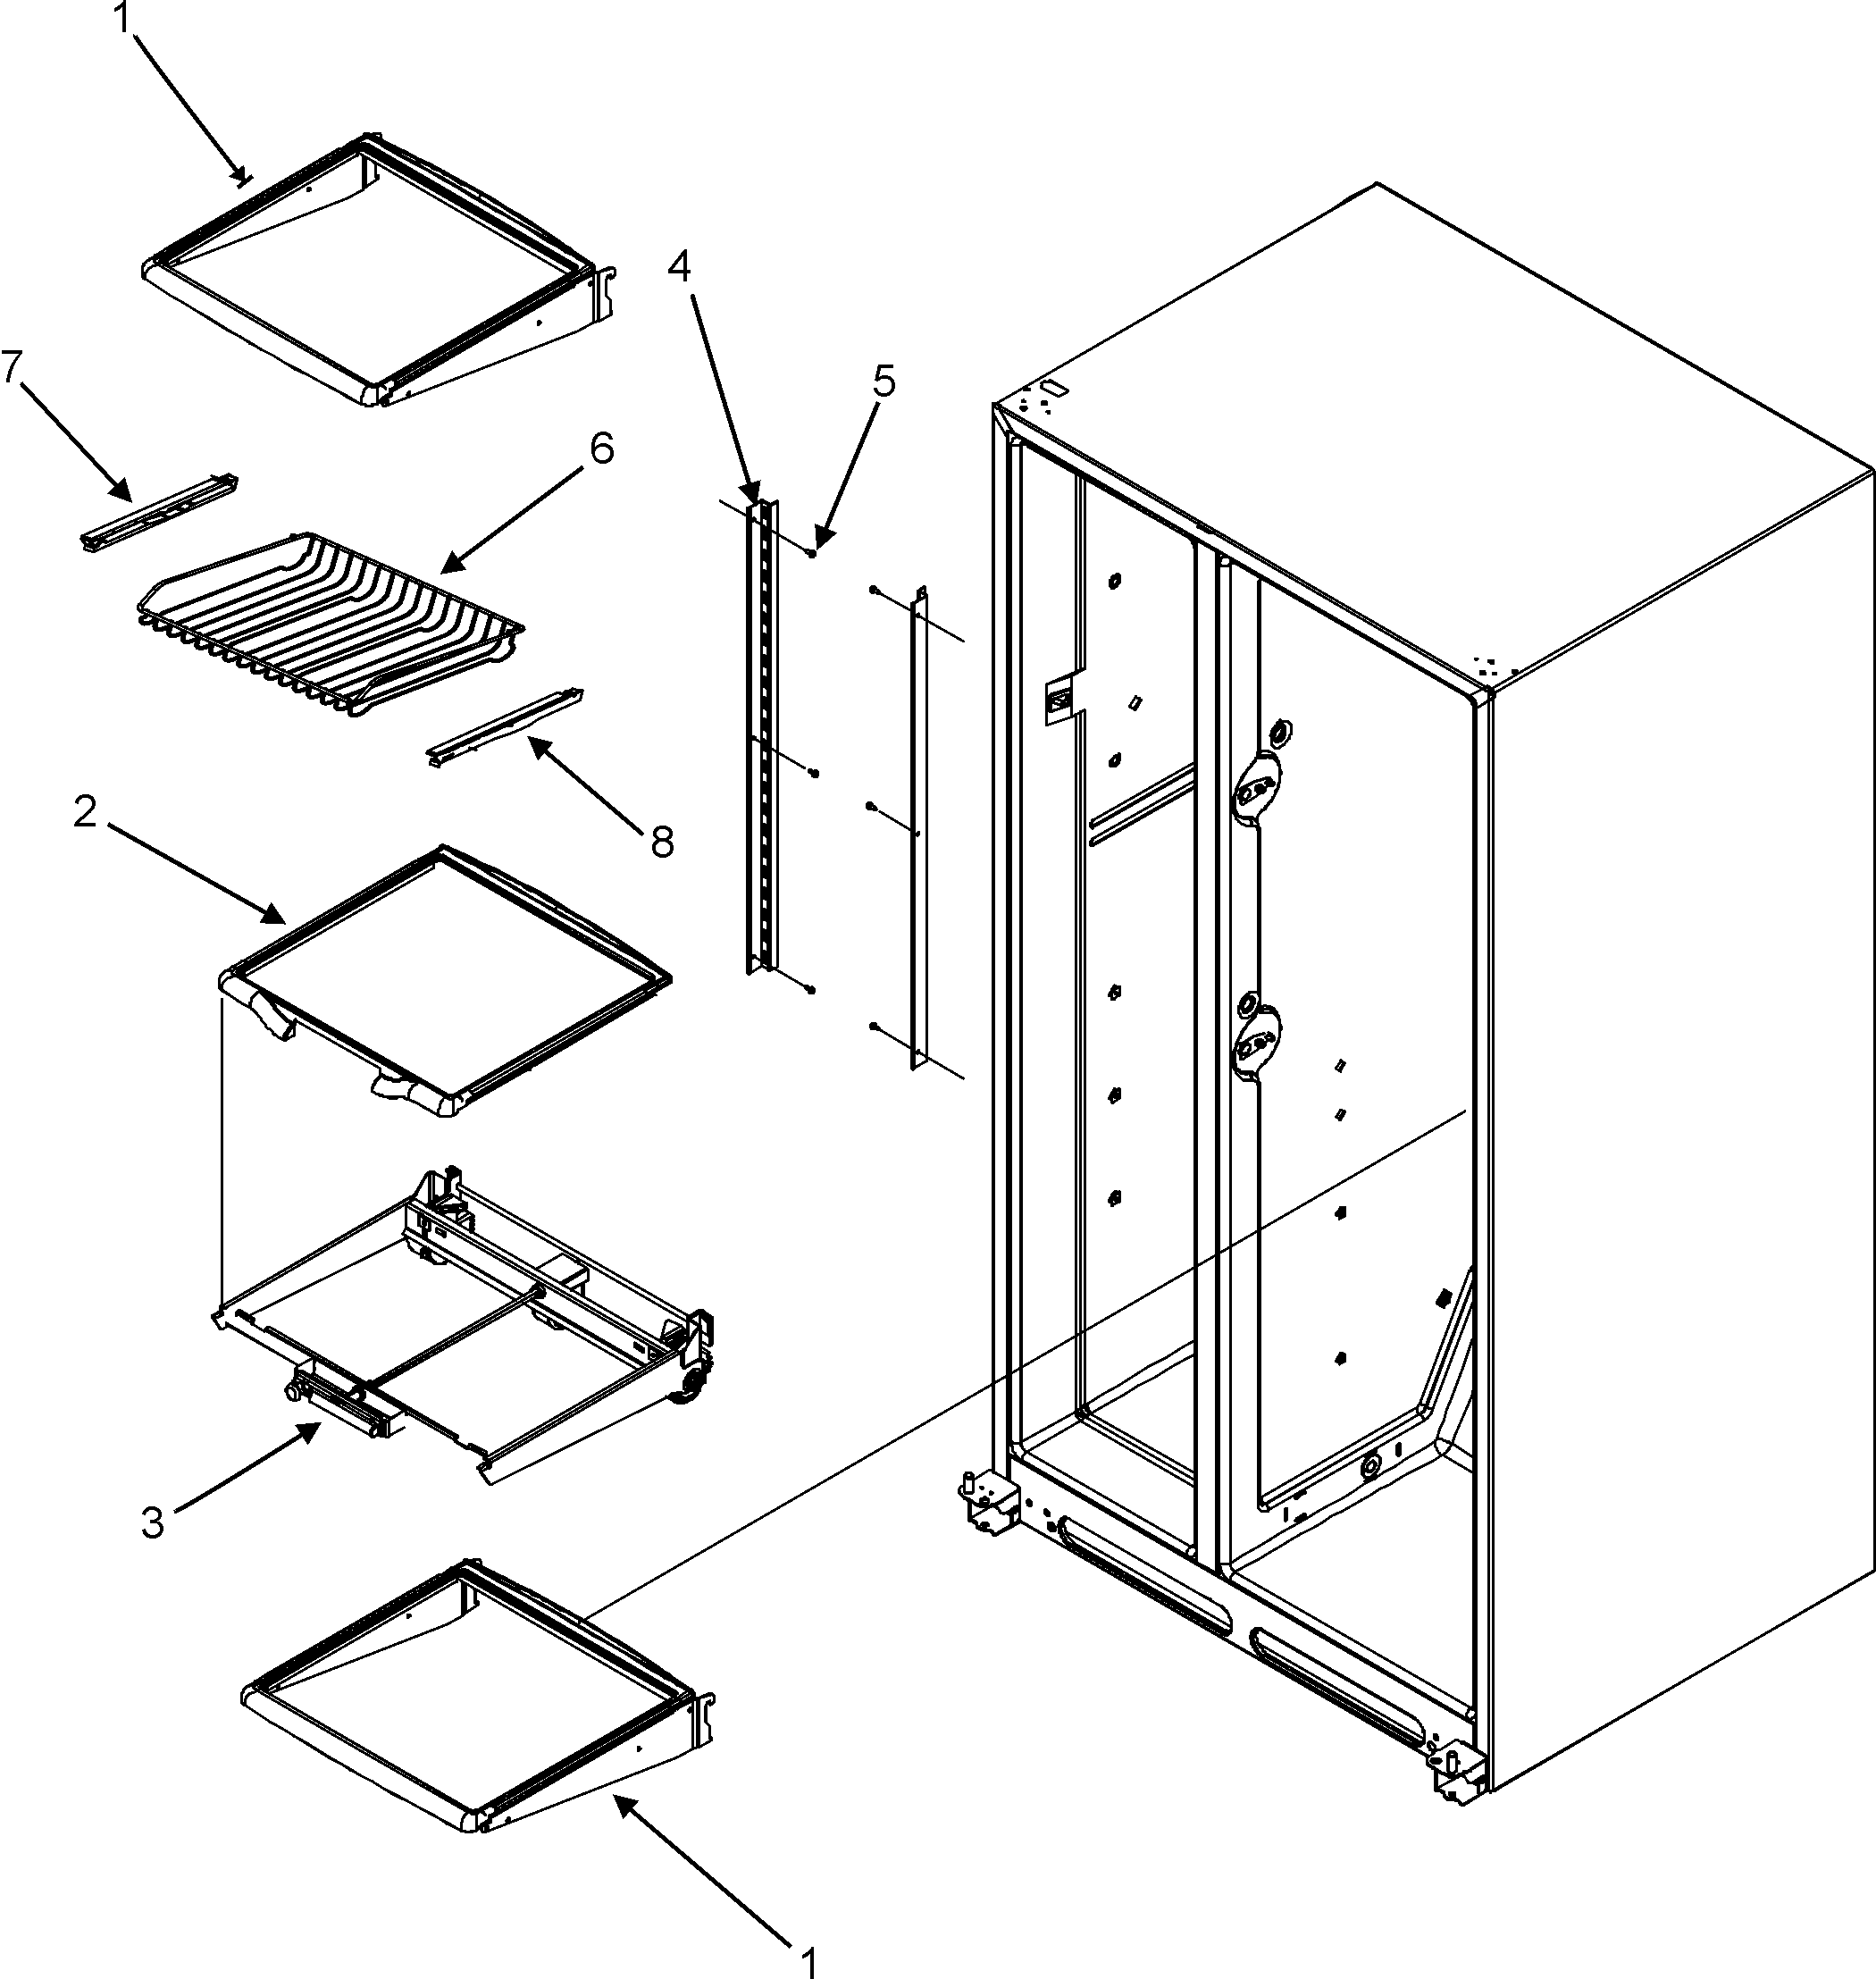 French Door Refrigerator: Maytag Refrigerator French Door